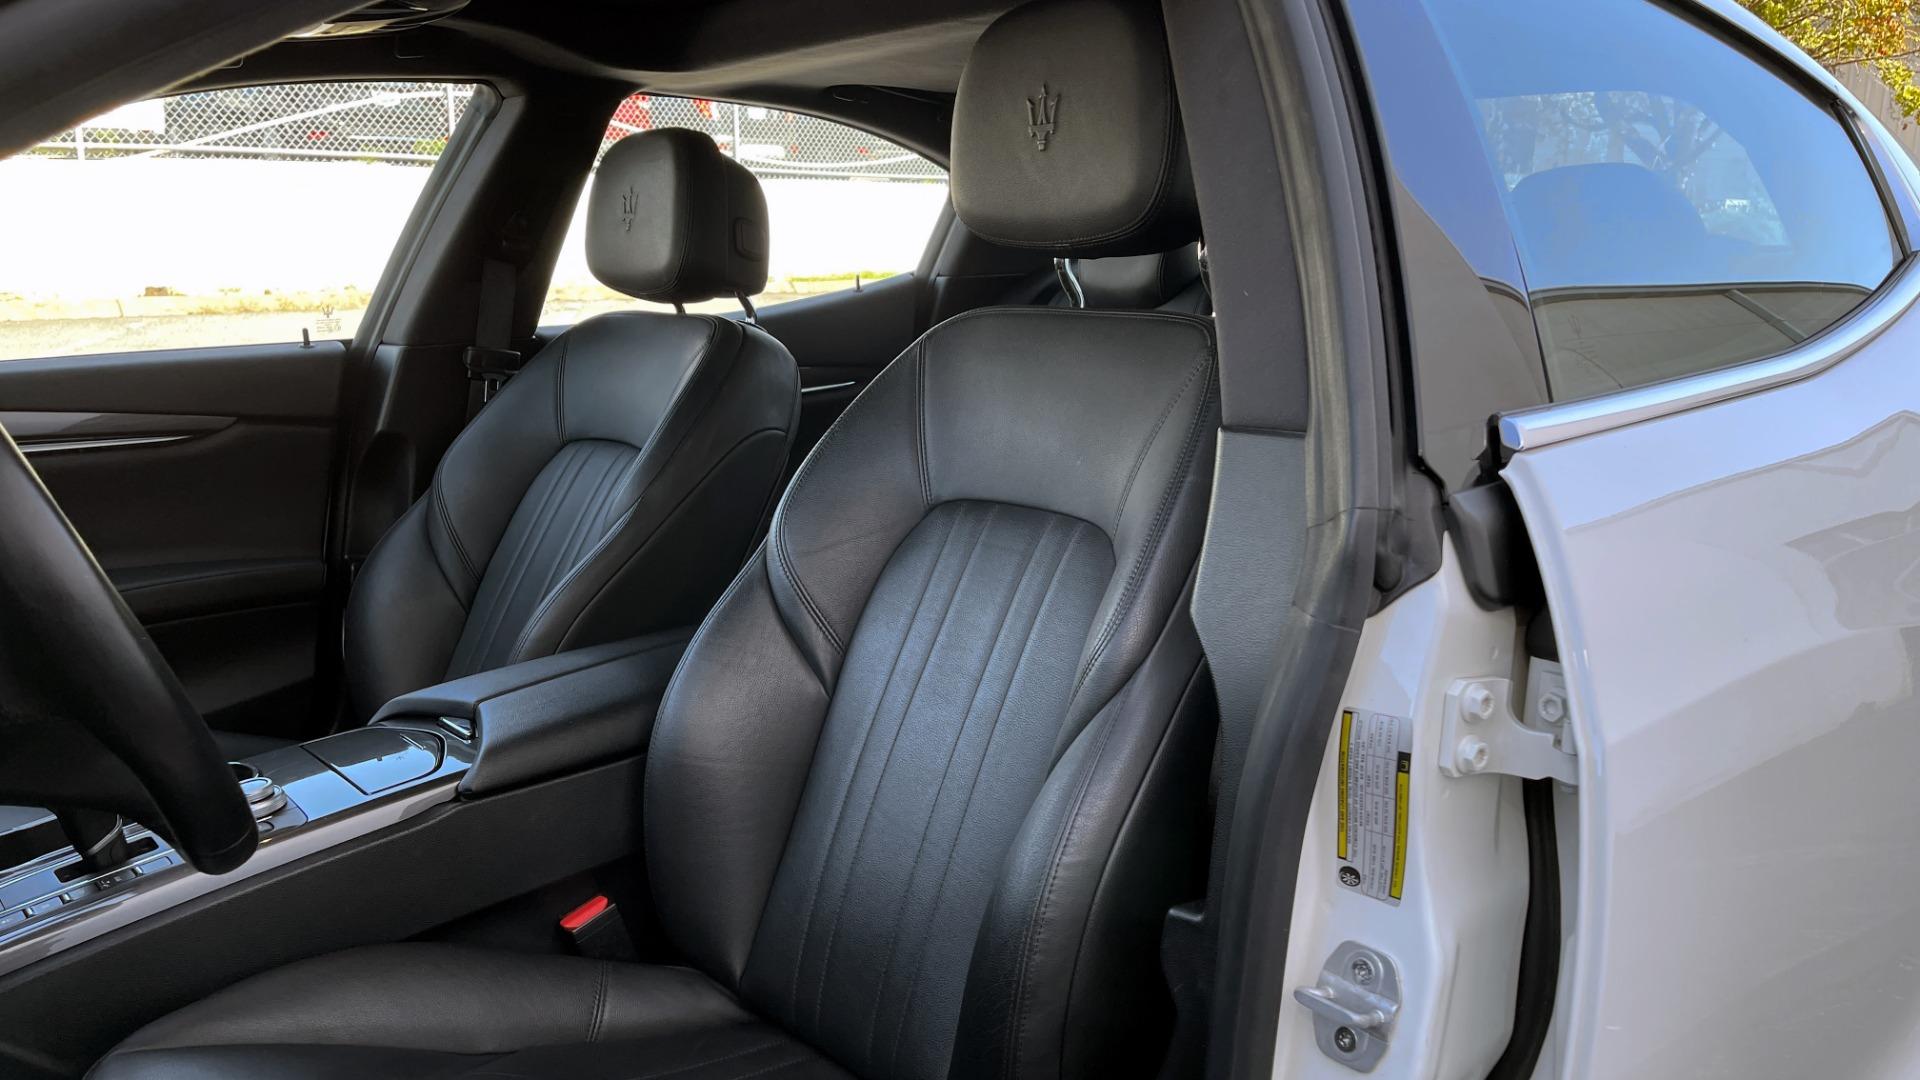 Used 2018 Maserati GHIBLI SEDAN / RWD / 3.0L V6 / SUNROOF / NAV / REARVIEW for sale $42,995 at Formula Imports in Charlotte NC 28227 32